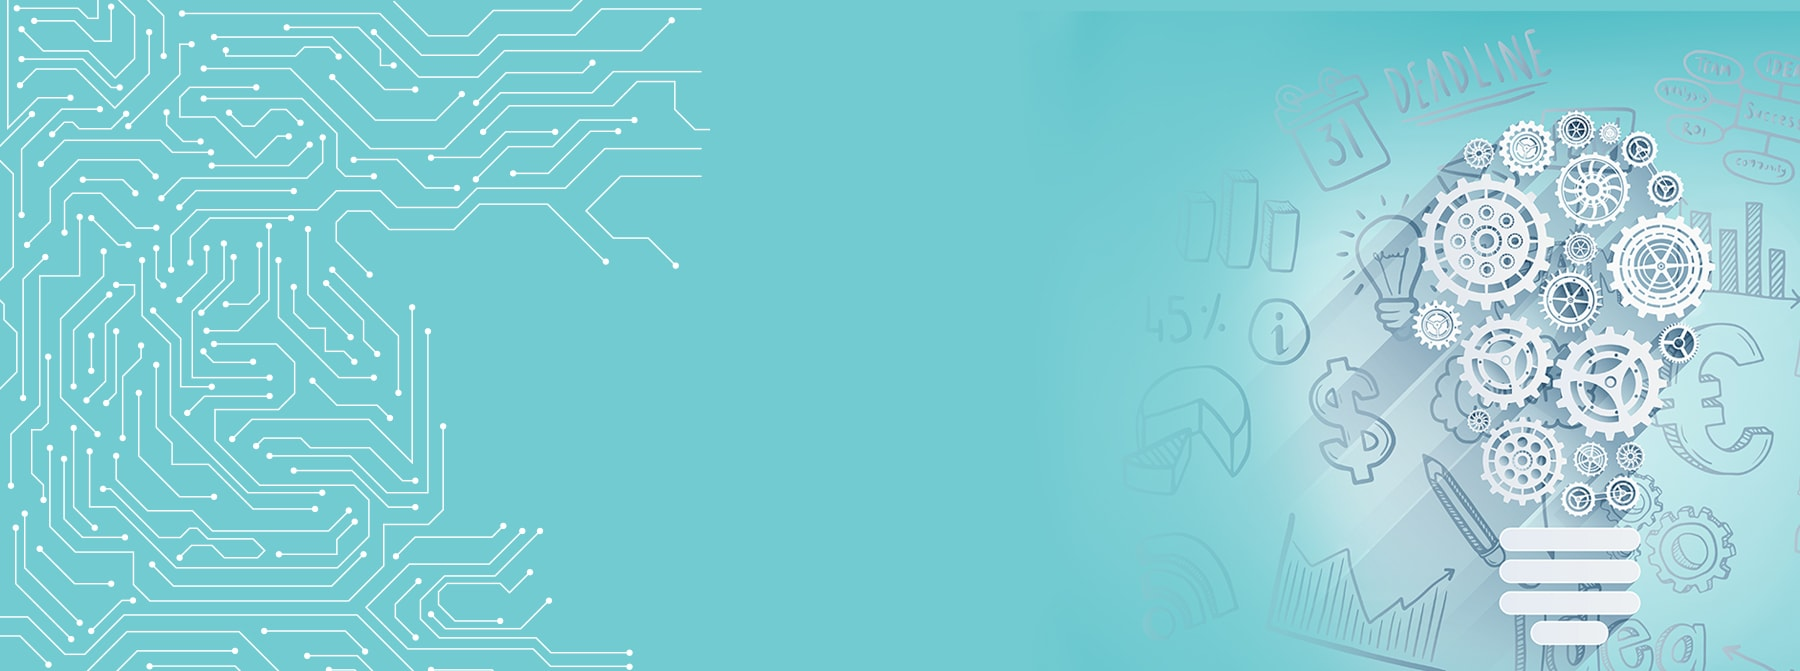 Why I Choose Ongraph As A Tech Partner?